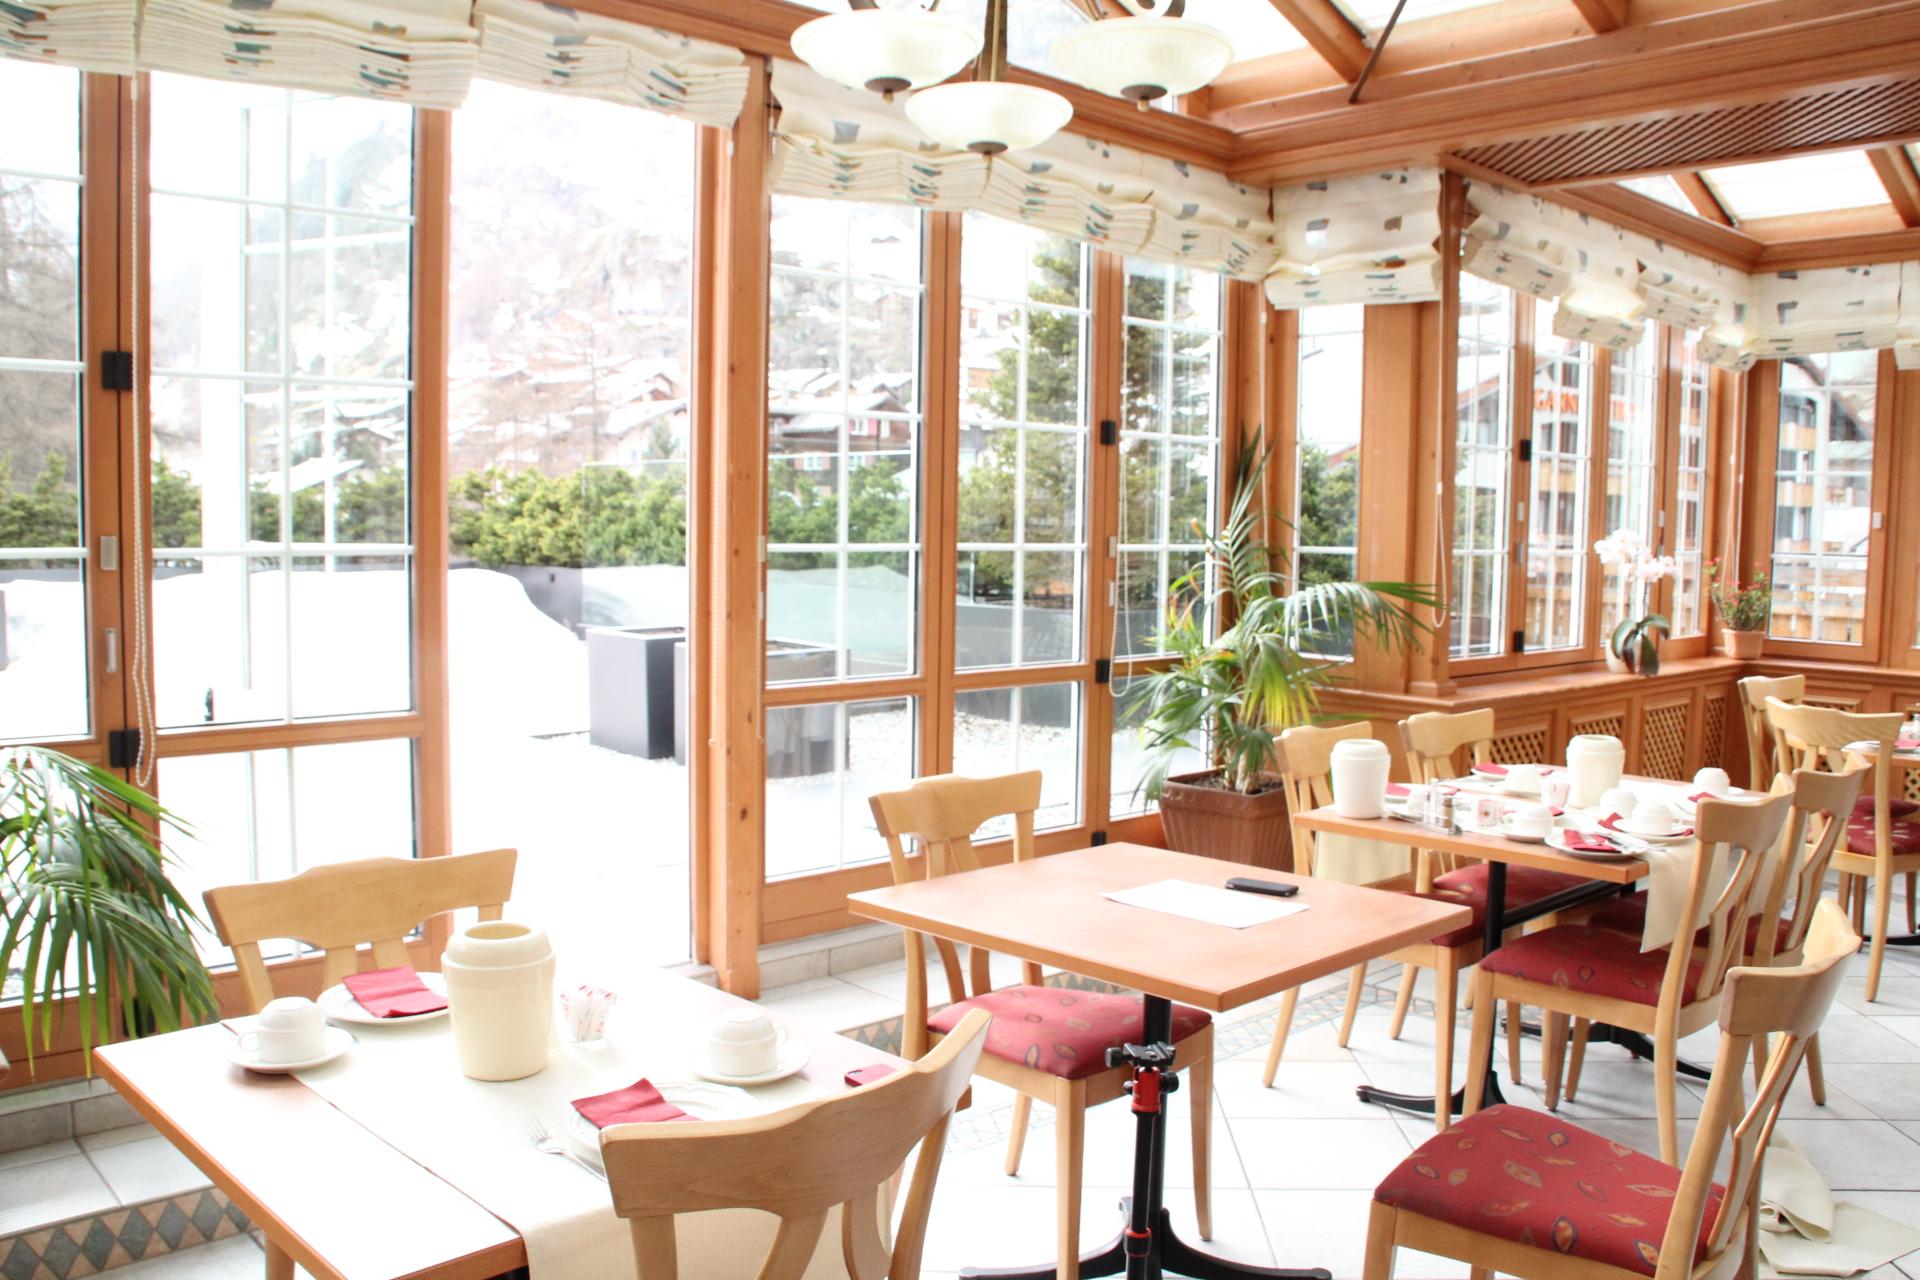 Hotel_Couronne-Zermatt-Terrasse-1-142928